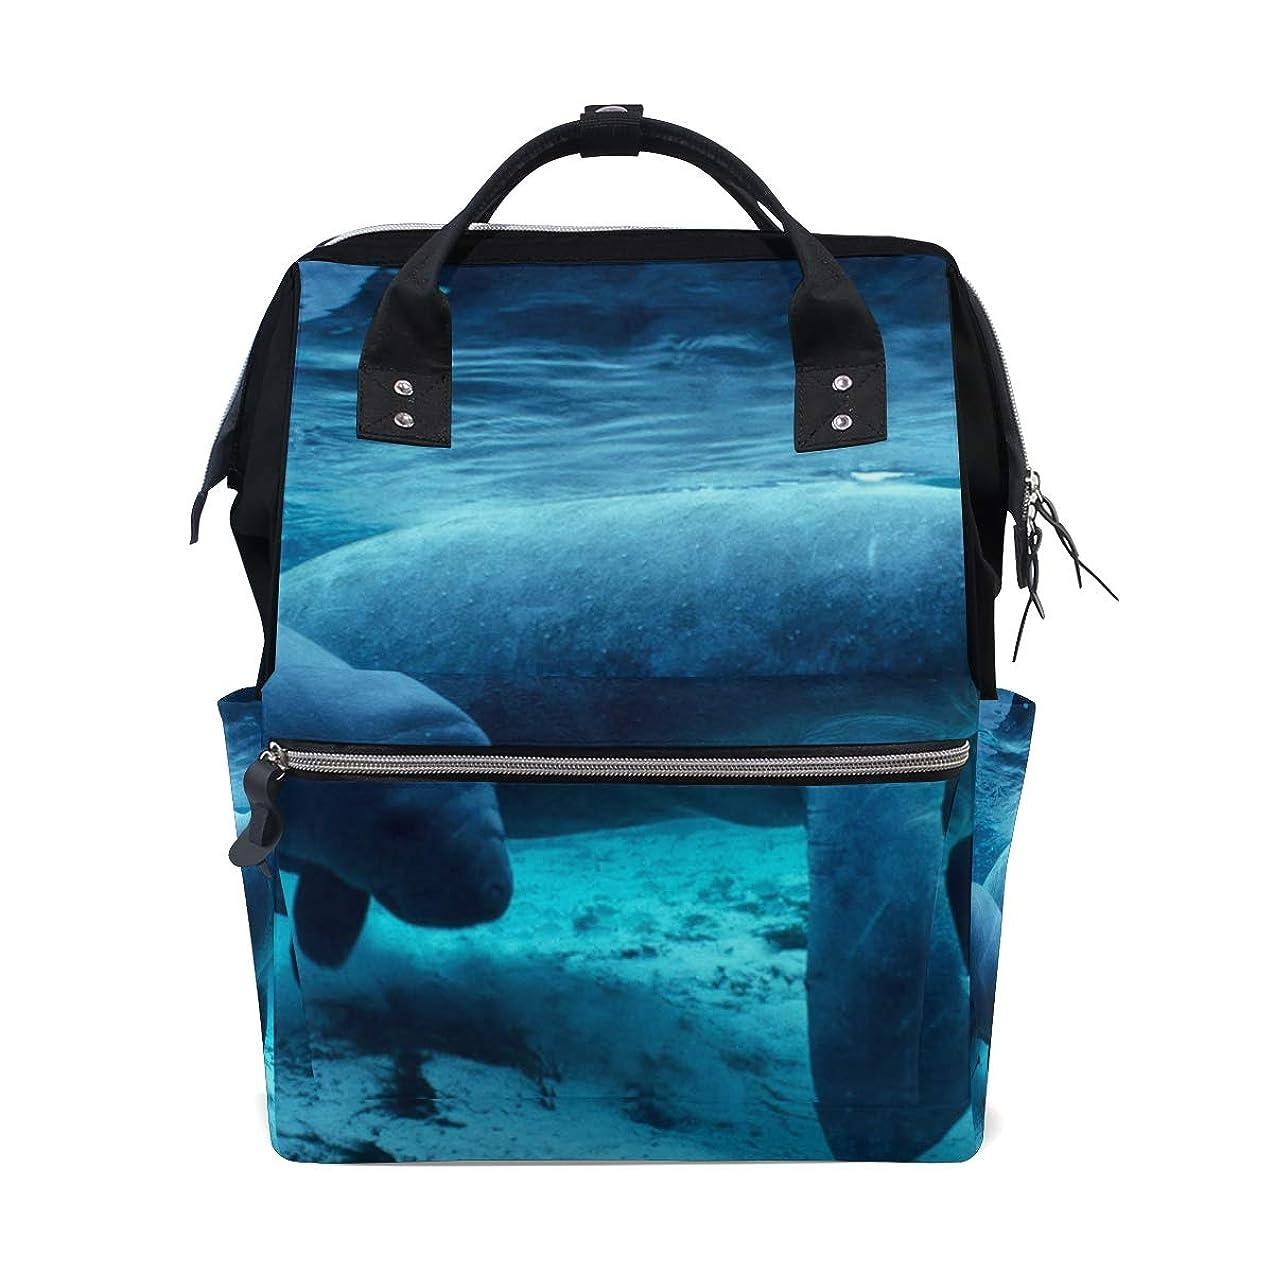 Manatee Sea Cow Blue School Backpack Large Capacity Mummy Bags Laptop Handbag Casual Travel Rucksack Satchel For Women Men Adult Teen Children